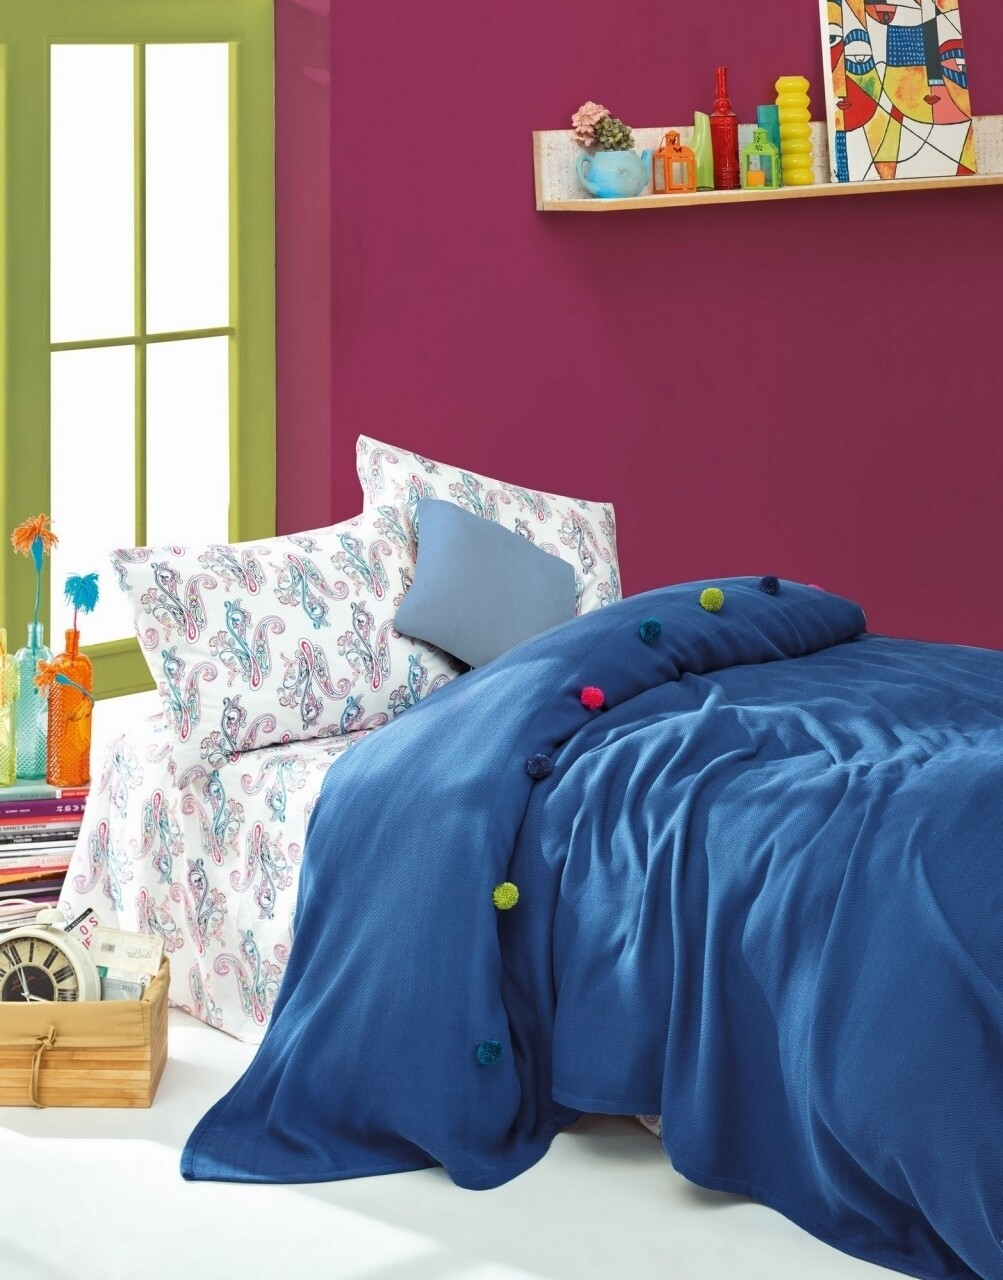 Set lenjerie de pat + cuvertura pentru o persoana, 3 piese, 100% bumbac ranforce, Cotton Box, Fancy Blue